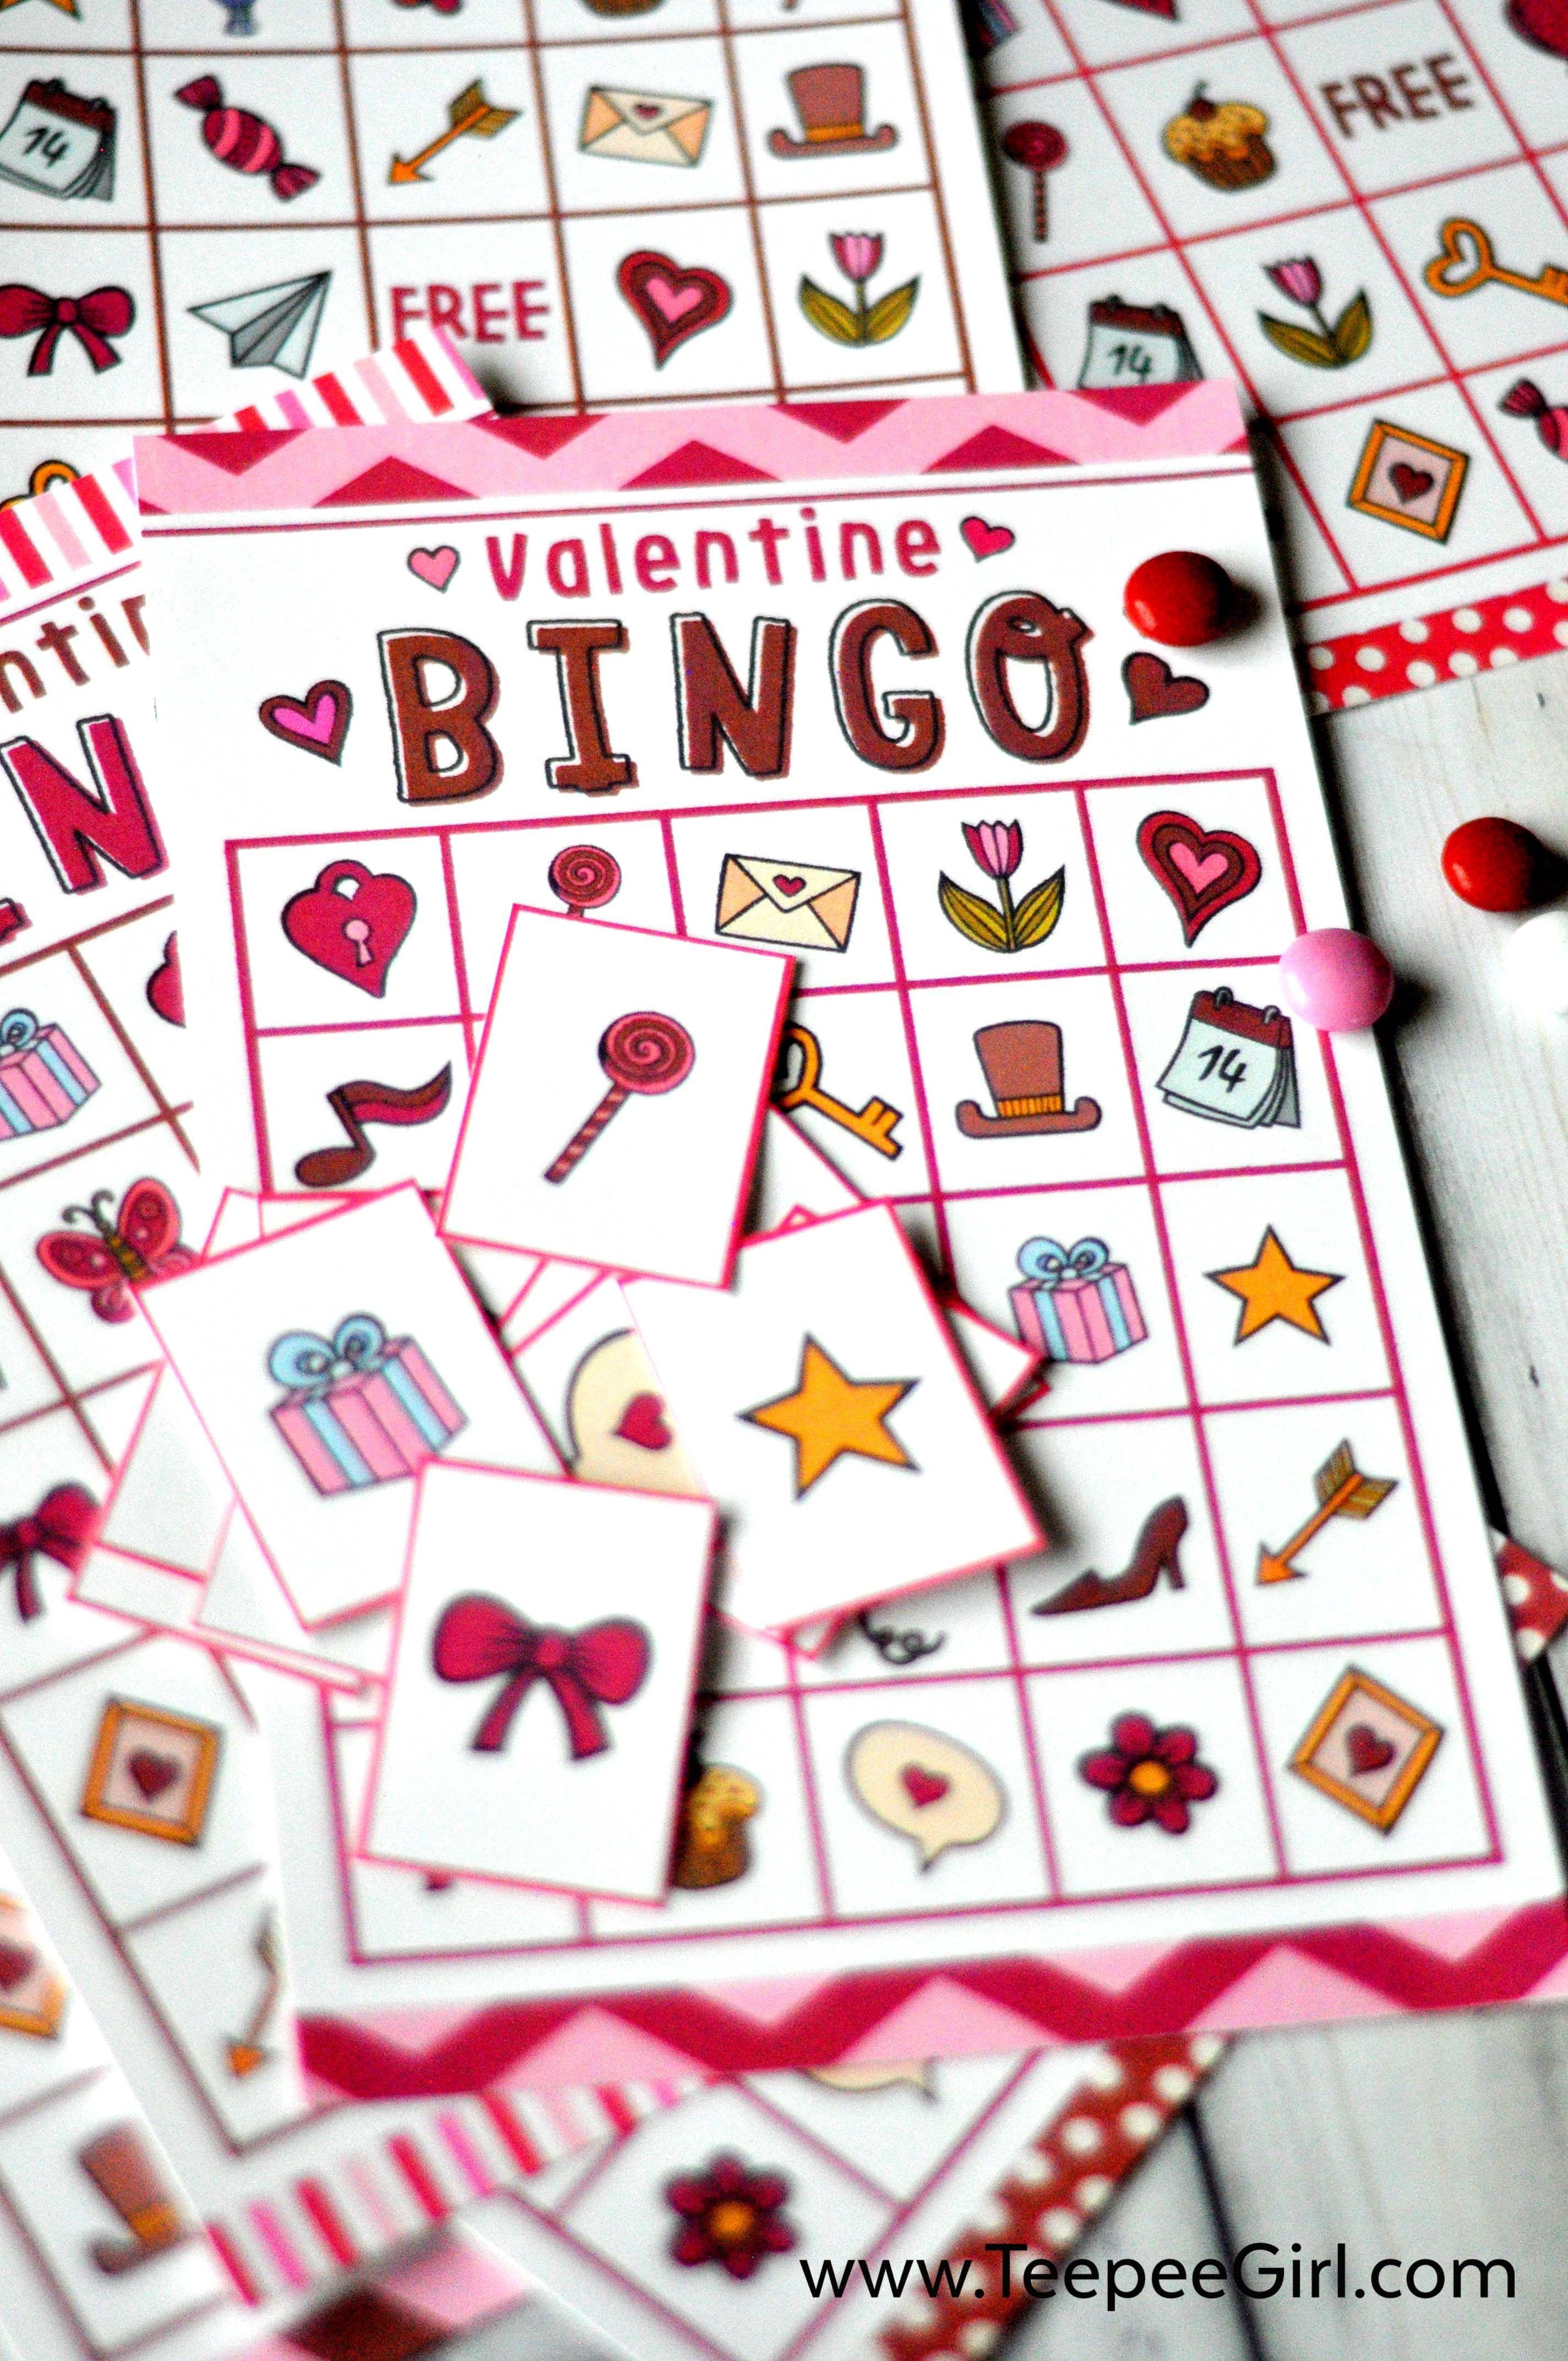 Free Valentines Day Printable Bingo Game